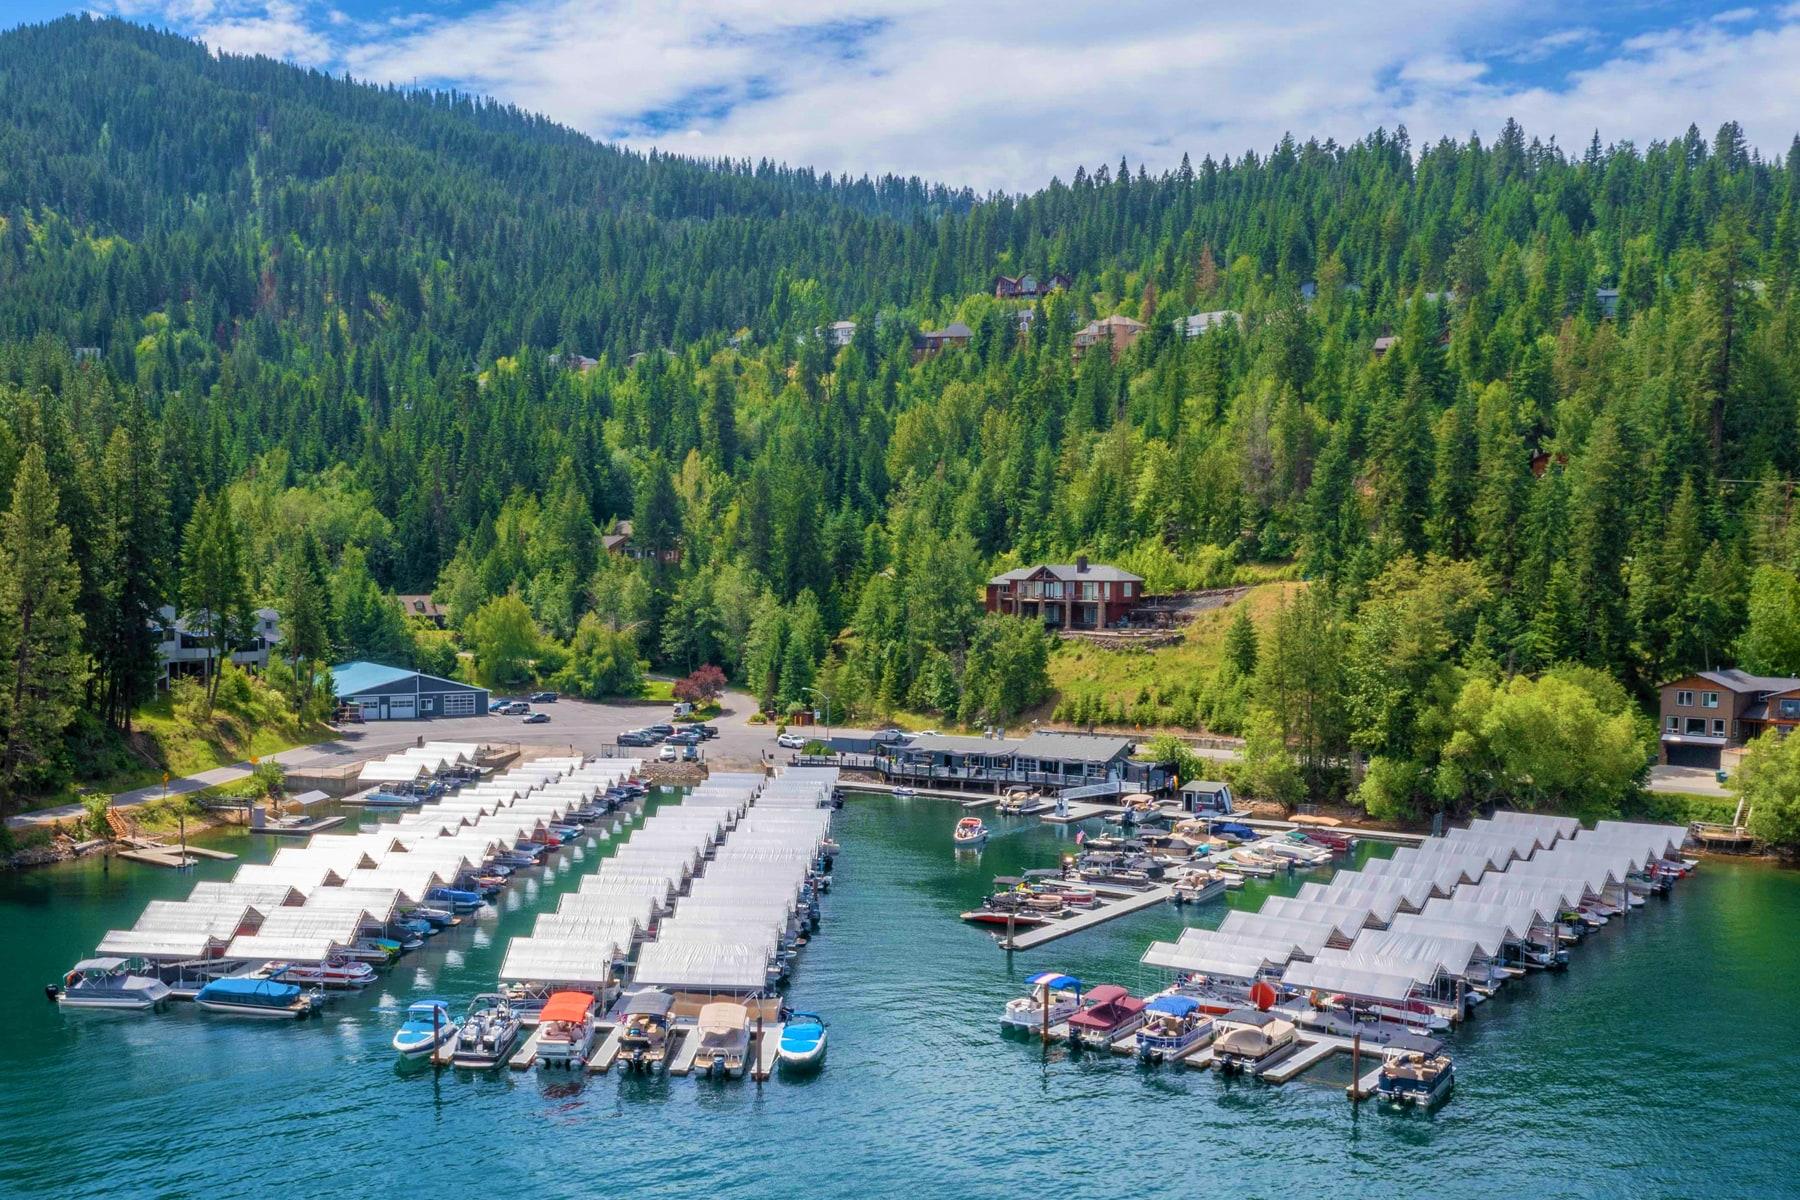 Hayden Lake Marina